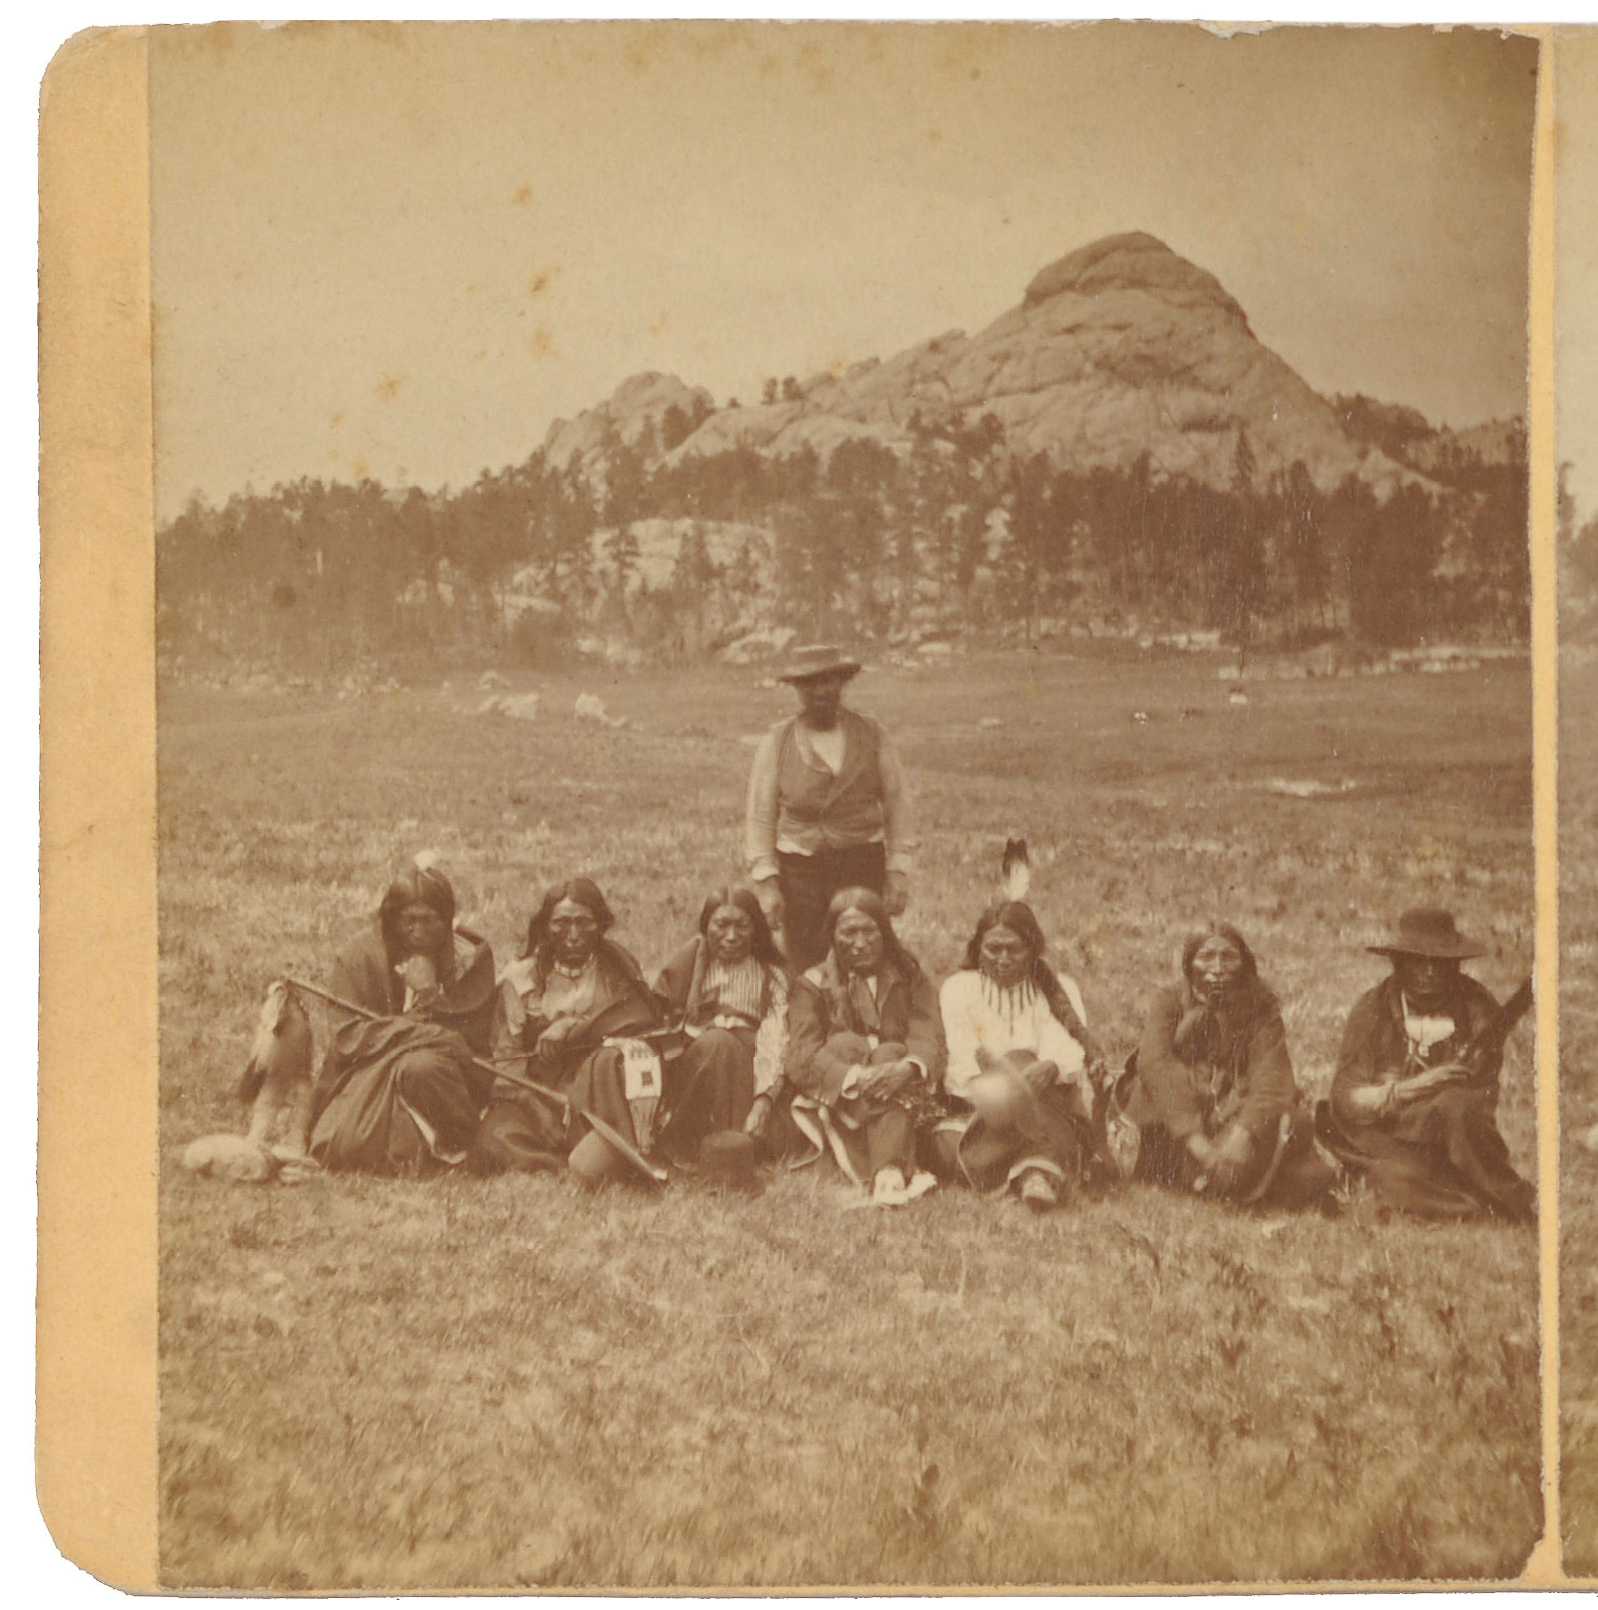 http://www.american-tribes.com/messageboards/dietmar/OglalainBlackHills.jpg